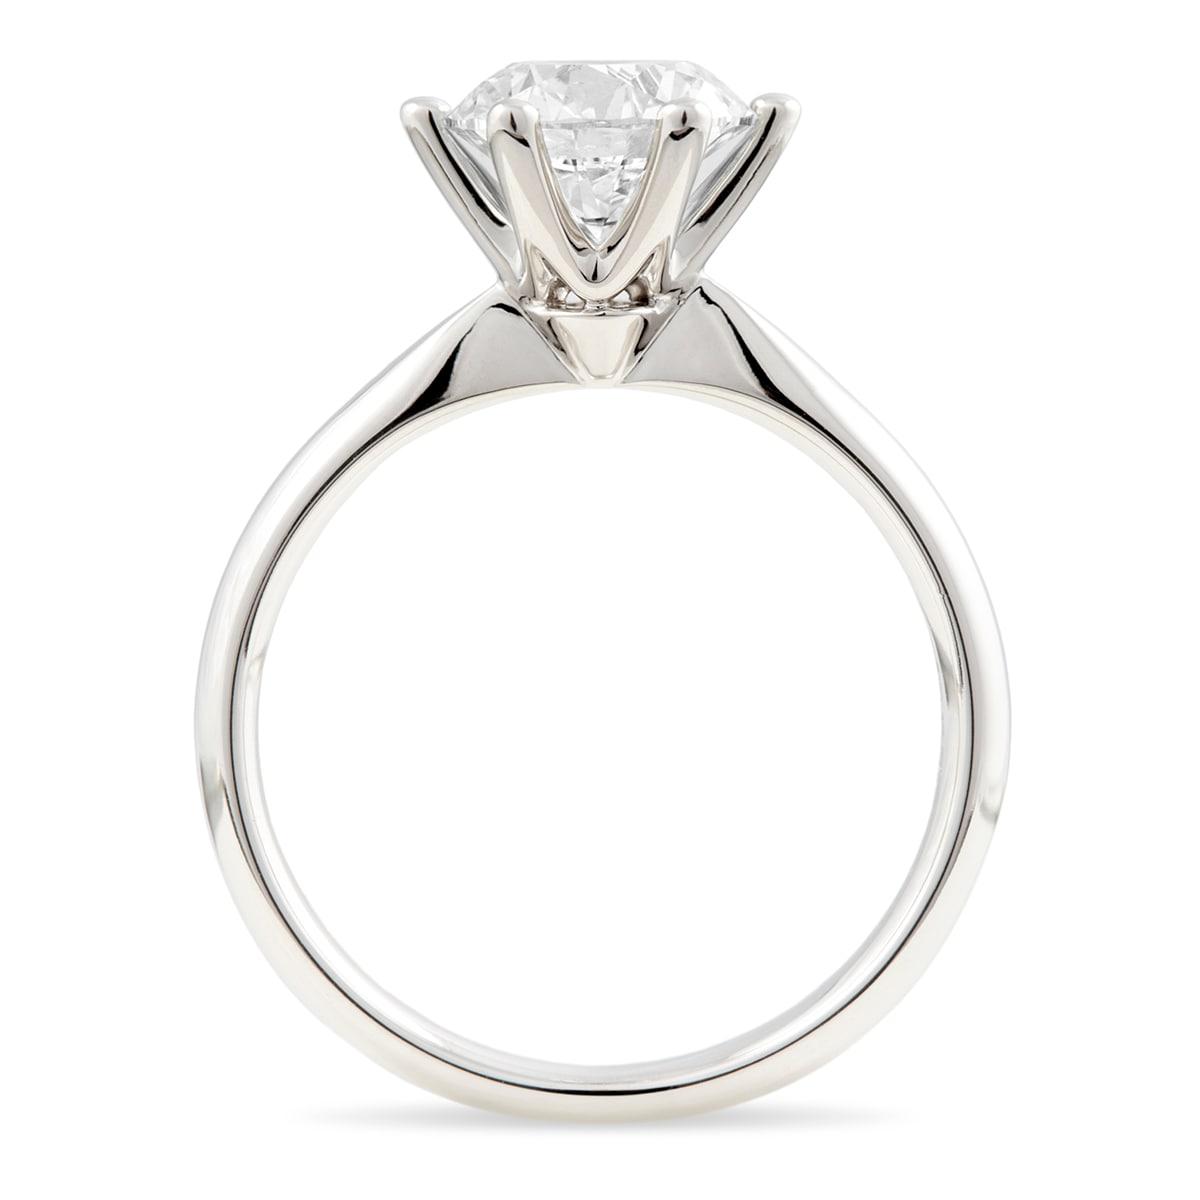 JSS_One_Carat_ring_RG_1,75ct_på_sidan_JS_121116_13129